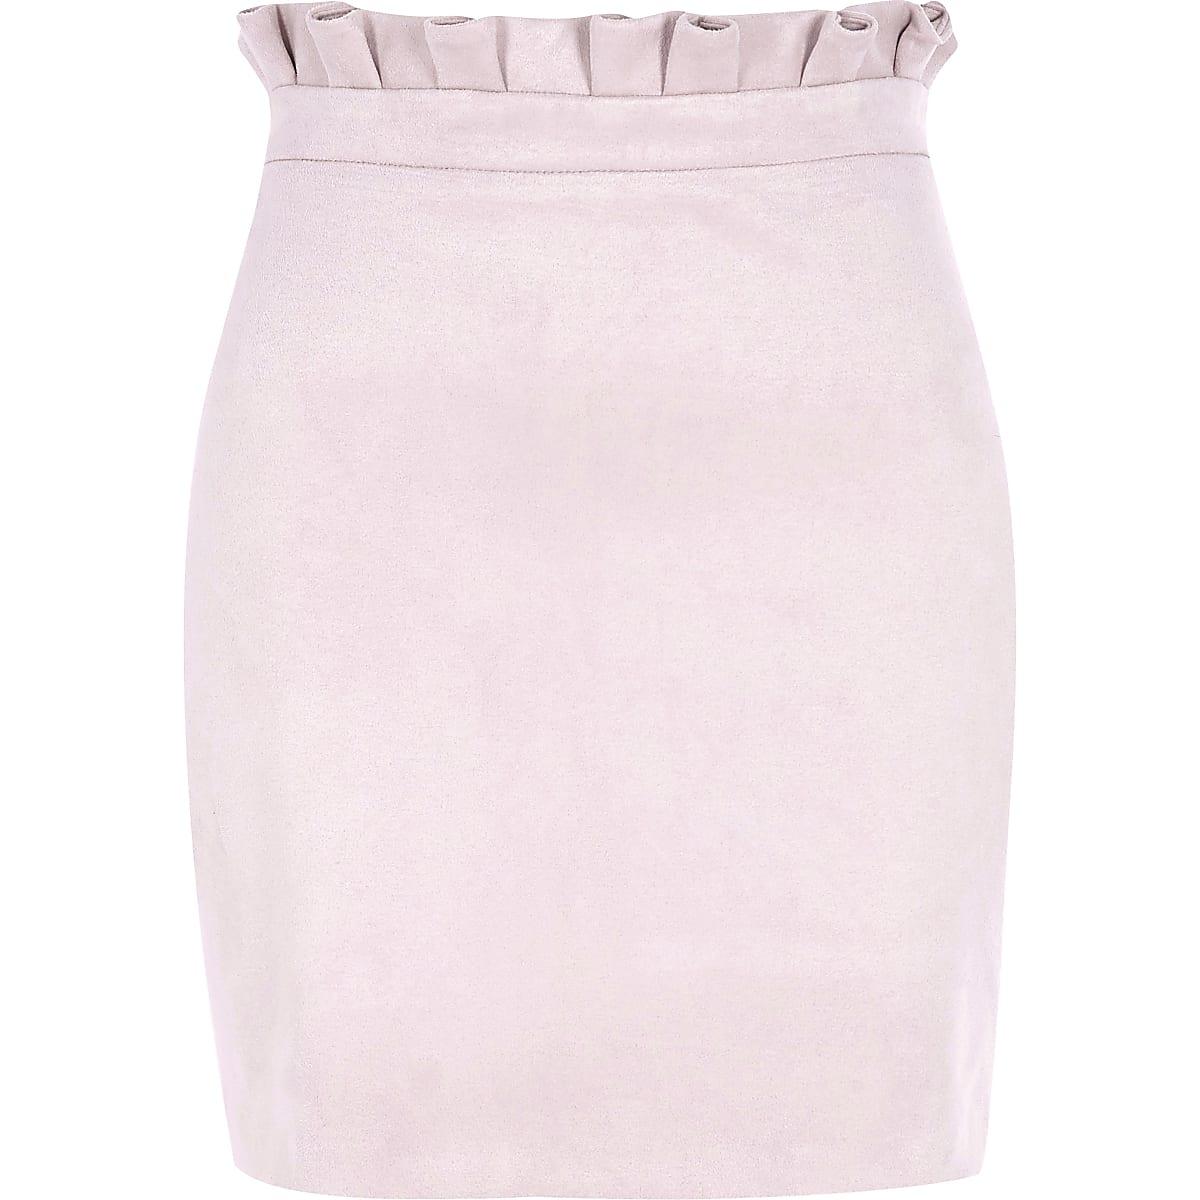 bdd341e6d Pink faux suede paperbag mini skirt - Mini Skirts - Skirts - women